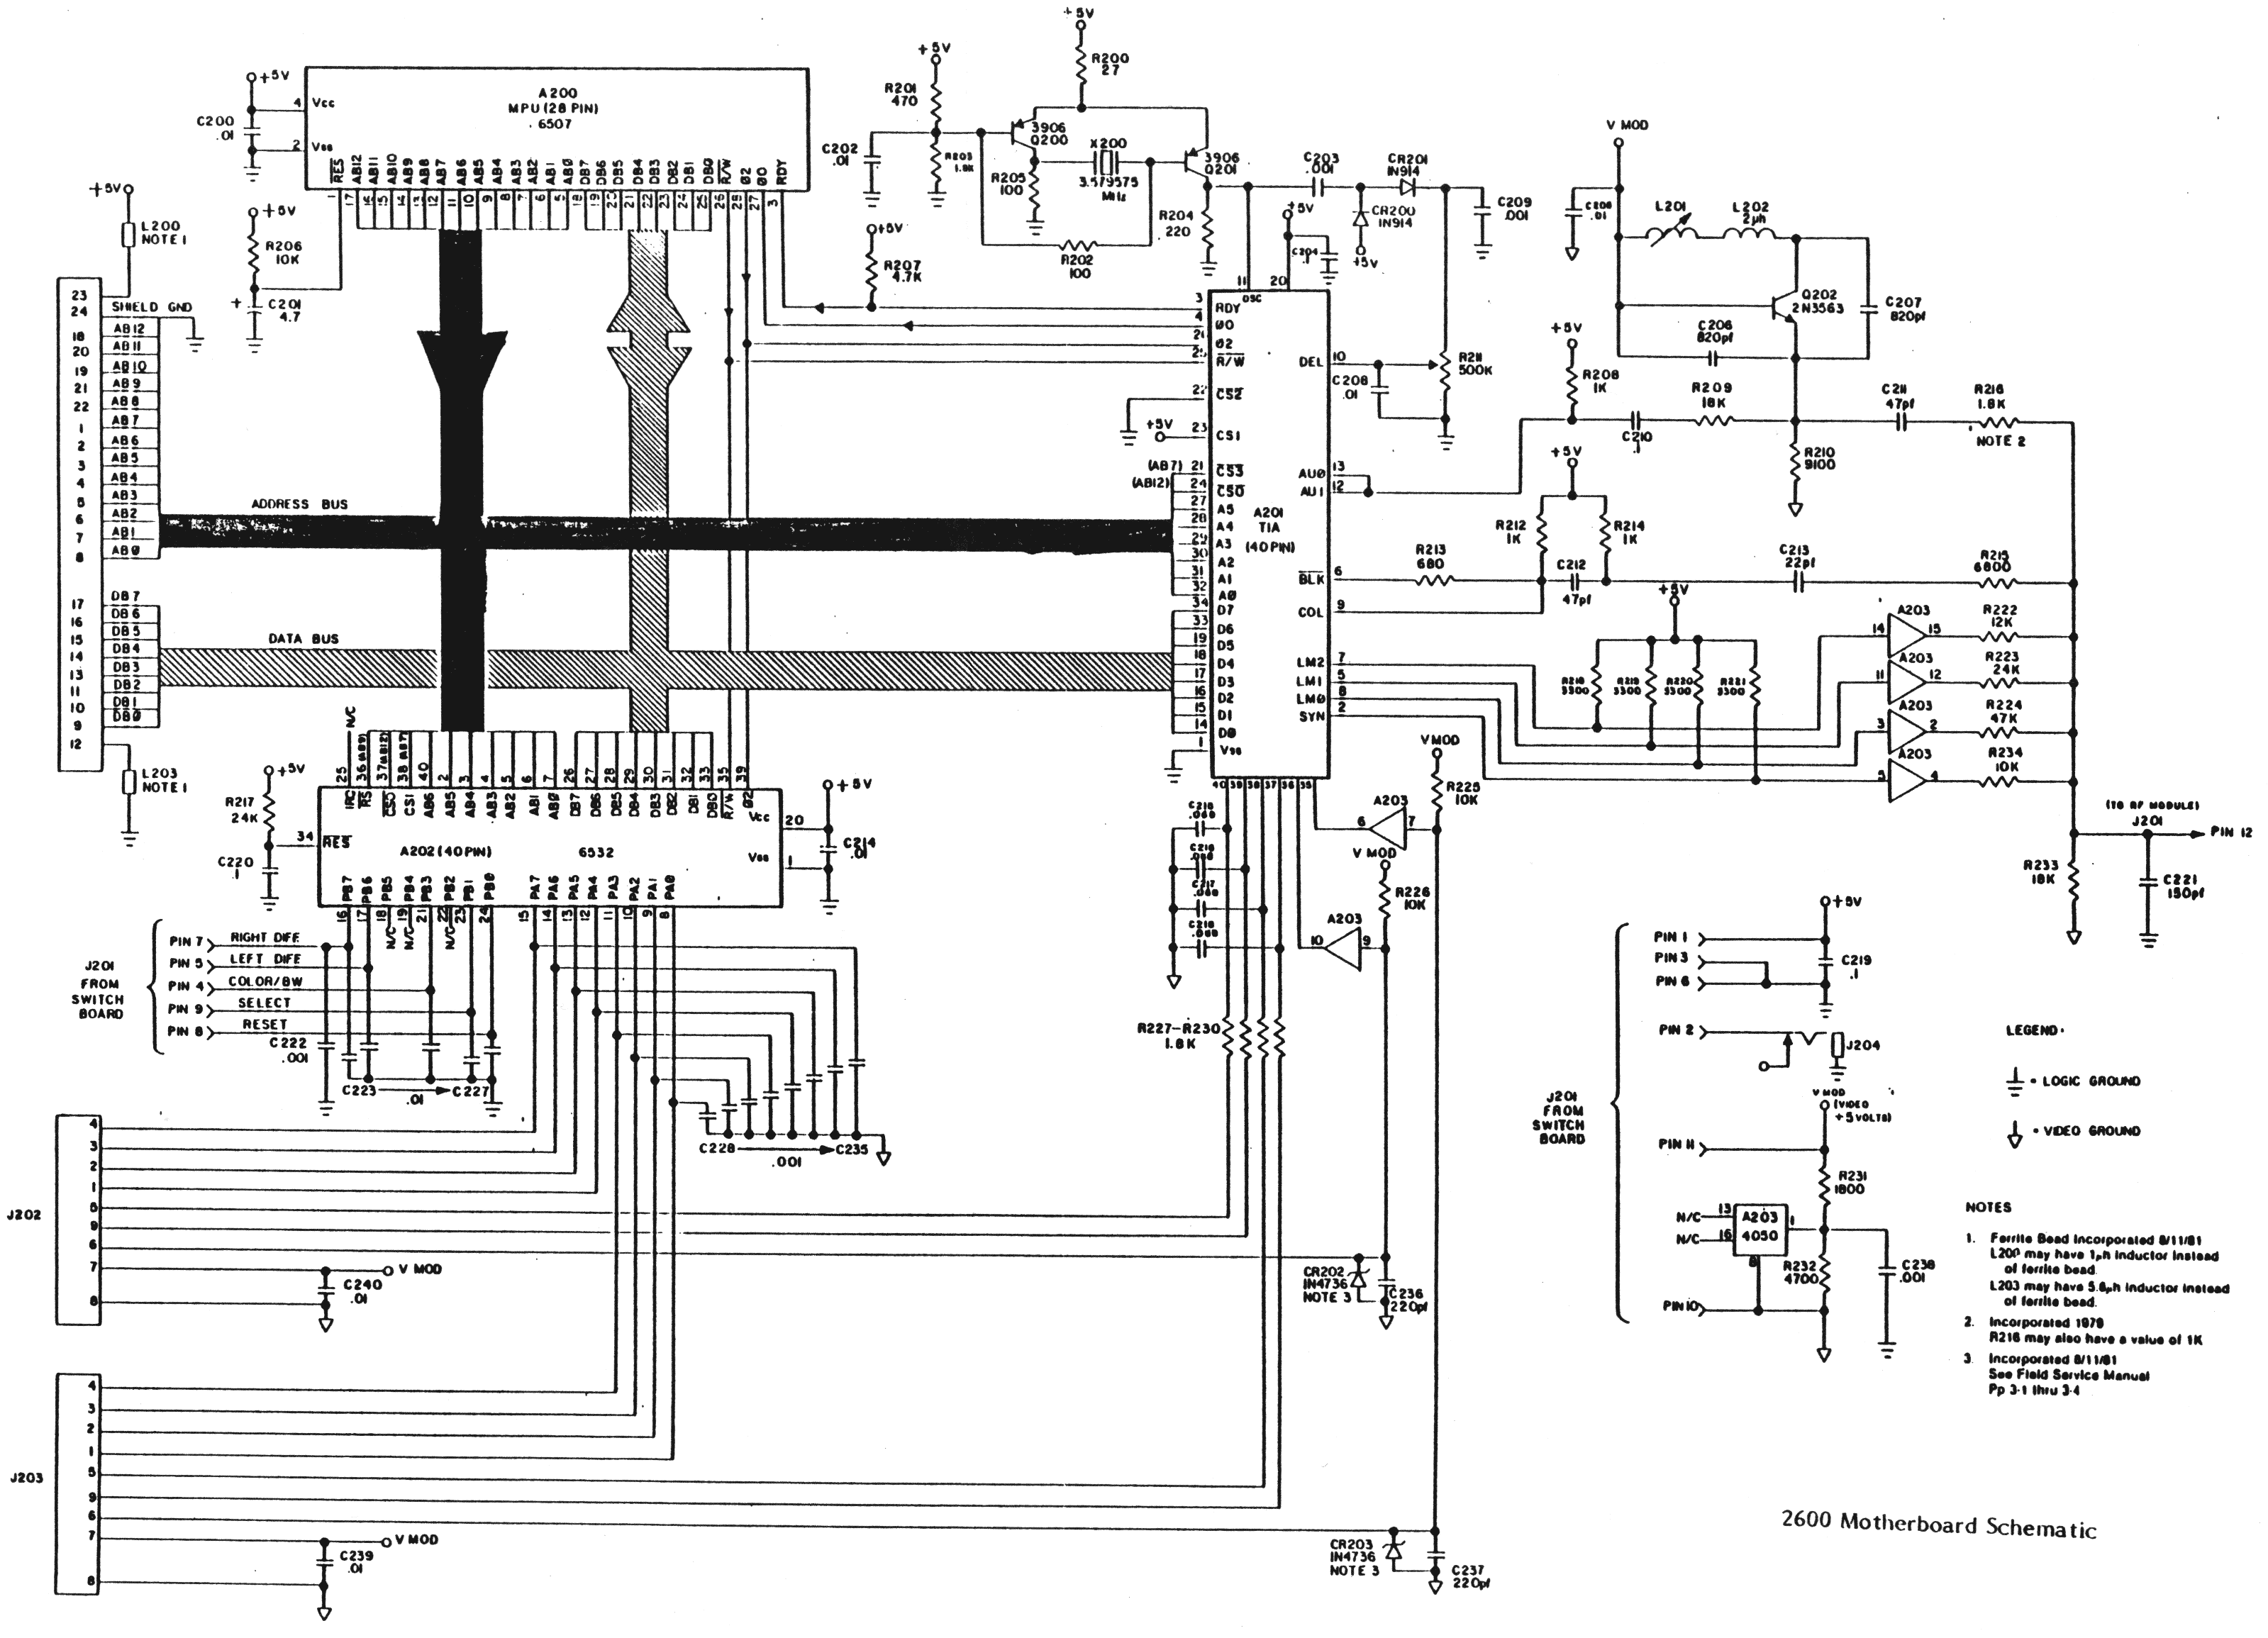 BC_6202] Toro Ss4235 Wiring Diagram Schematic WiringJebrp Faun Attr Benkeme Mohammedshrine Librar Wiring 101